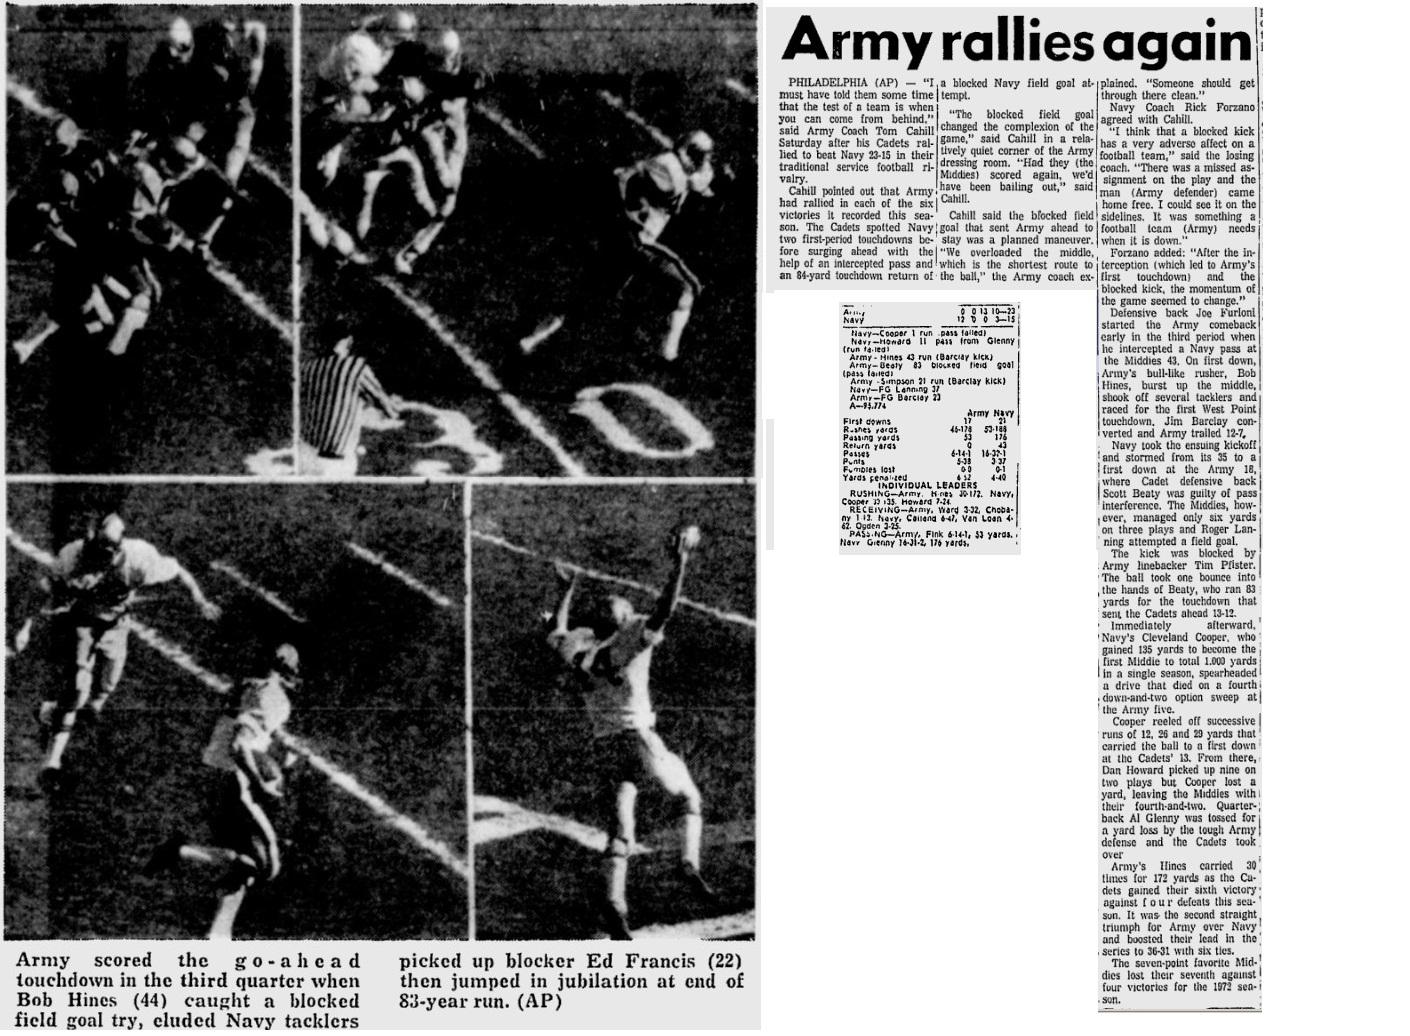 armyfb_1972_vsnavy-bobhines_1972